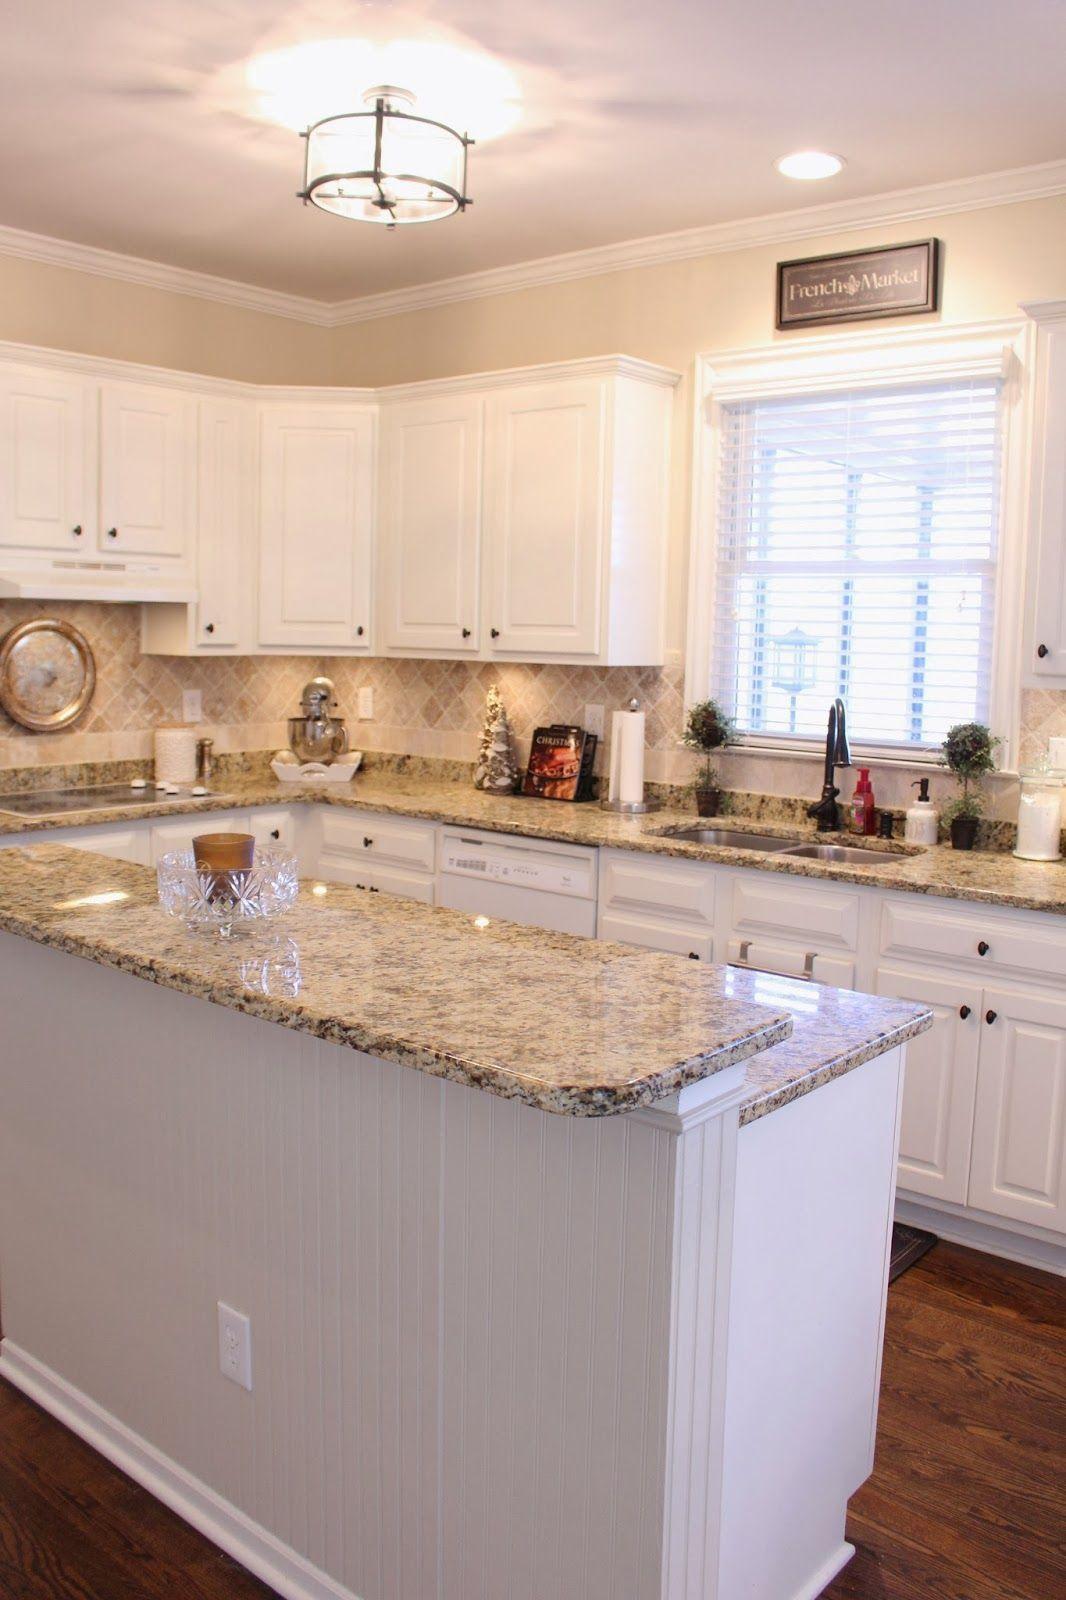 Luxury White Kitchen Cabinets Beige Countertop The Brilliant In Addition To Attractive White Kitchen C Kitchen Cabinets Decor Kitchen Remodel Neutral Kitchen